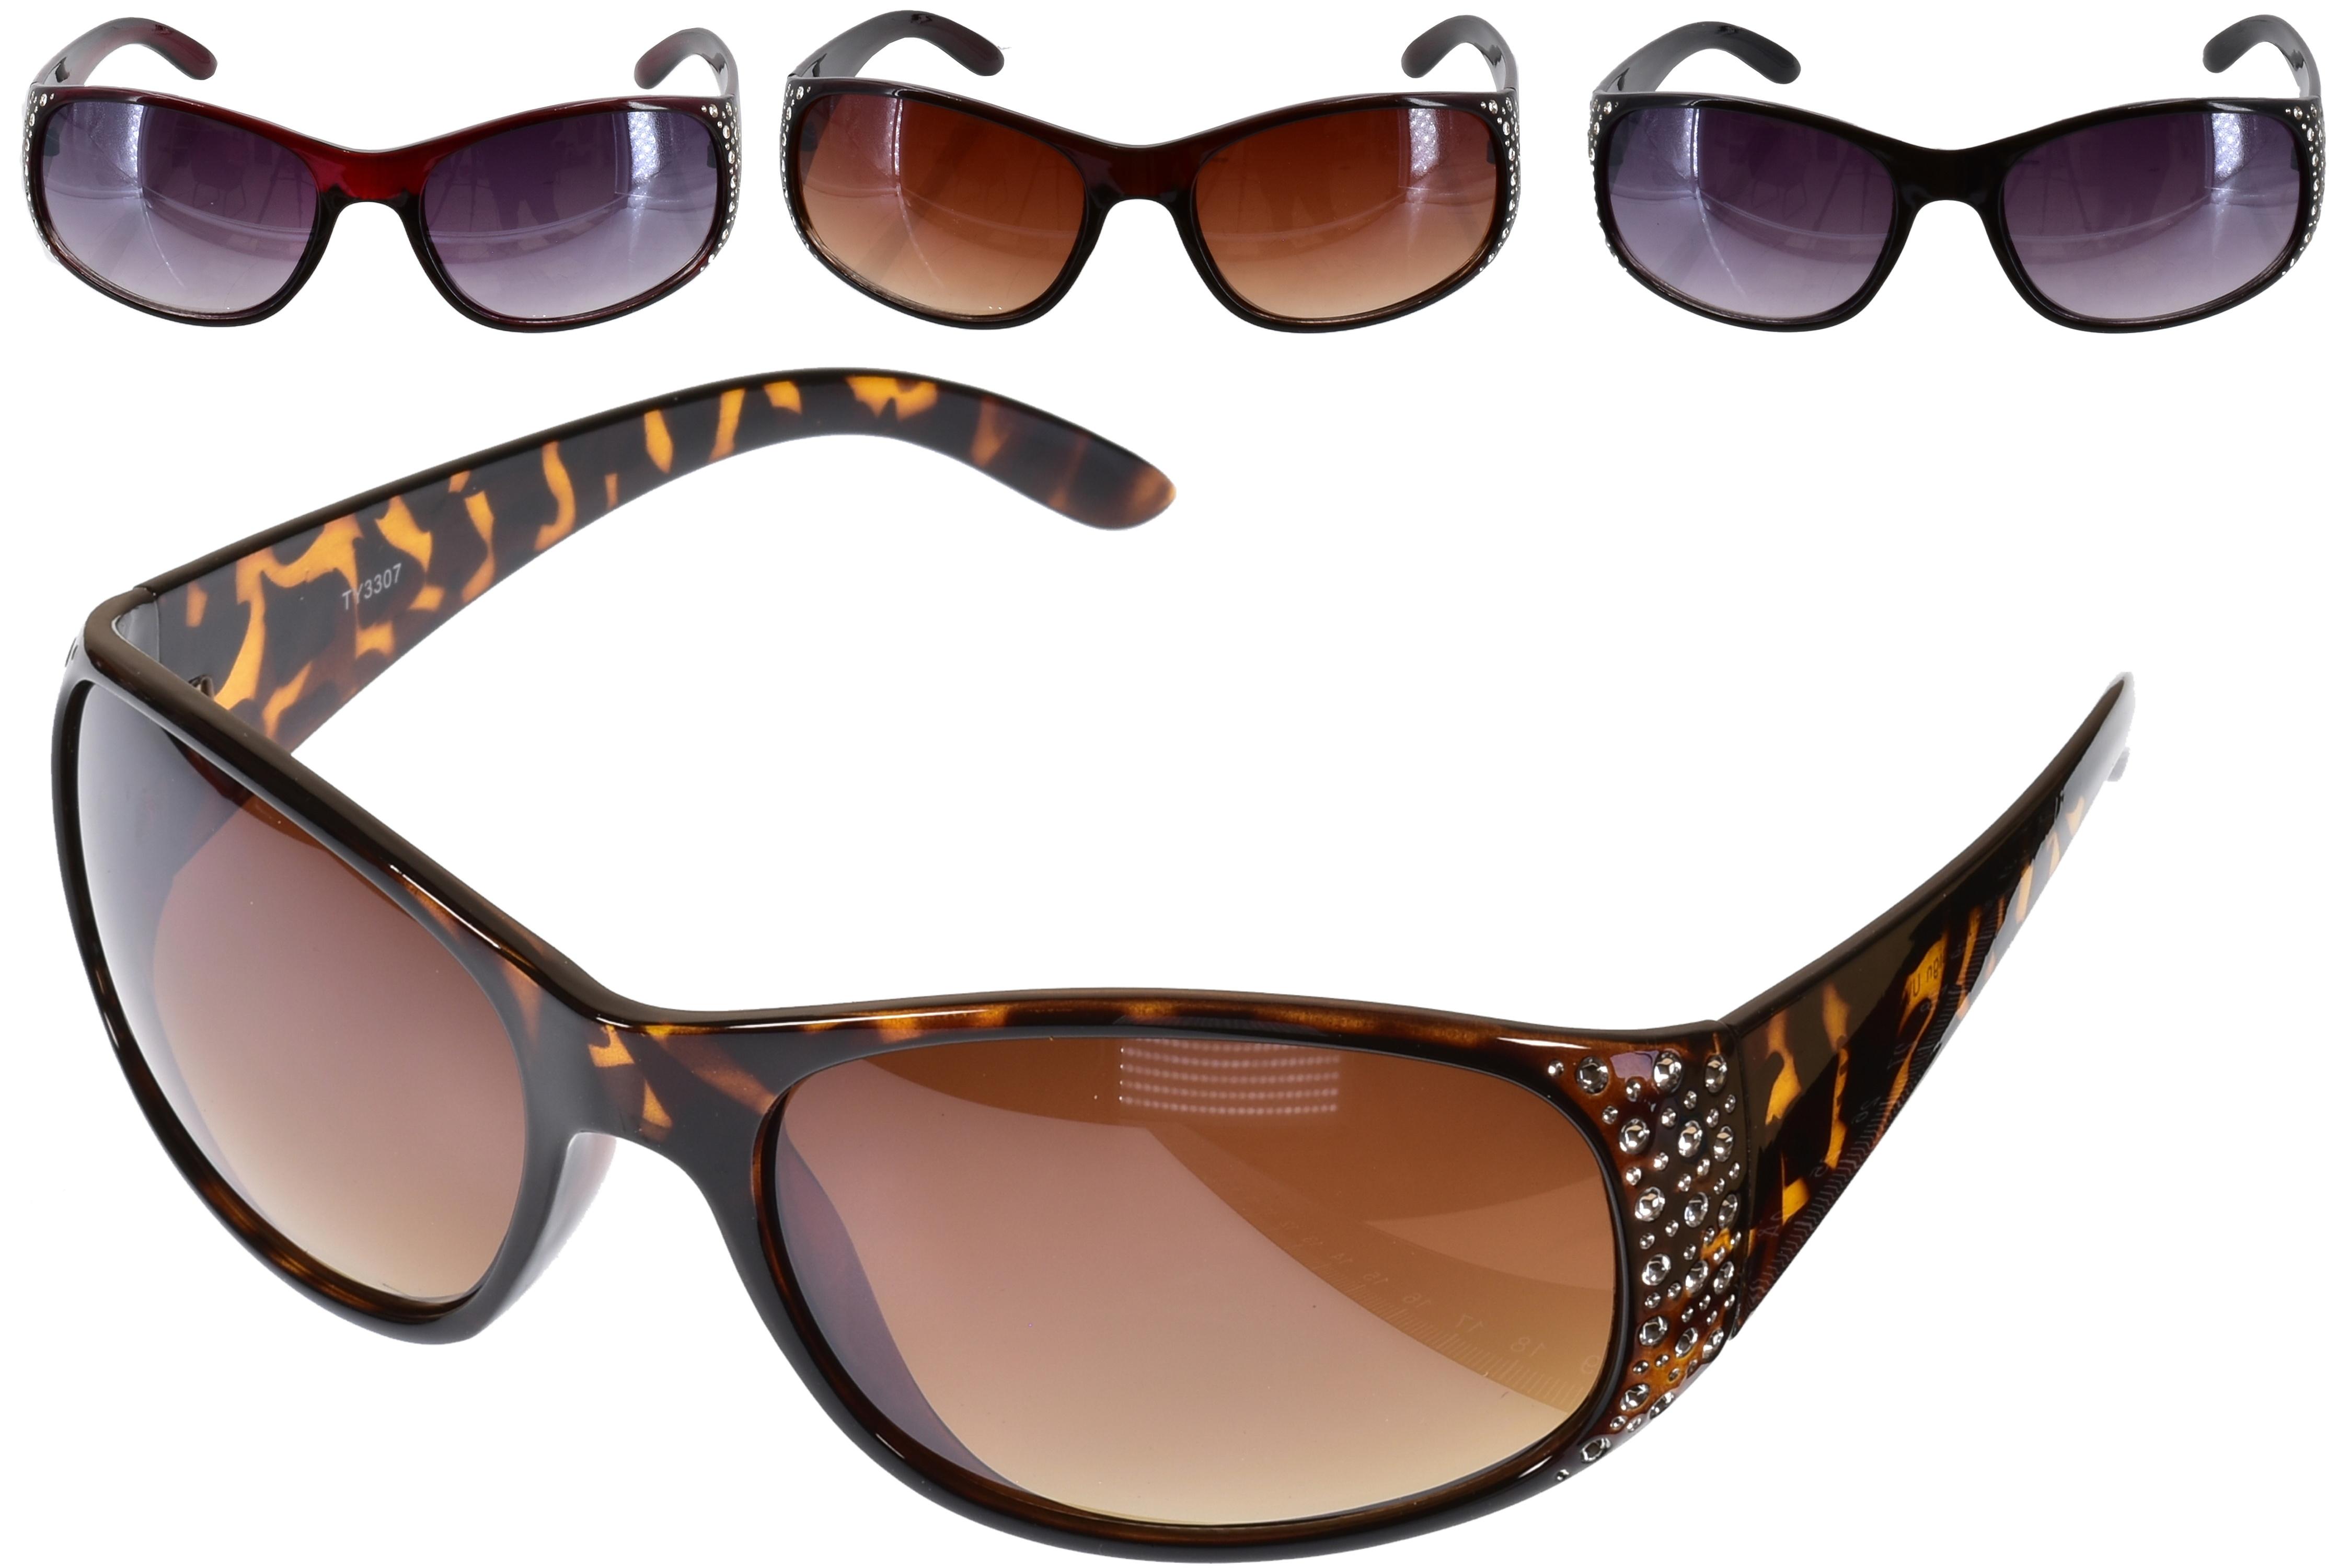 Ladies Plastic Frame Designer S/Glasses With Gems 4 Ass